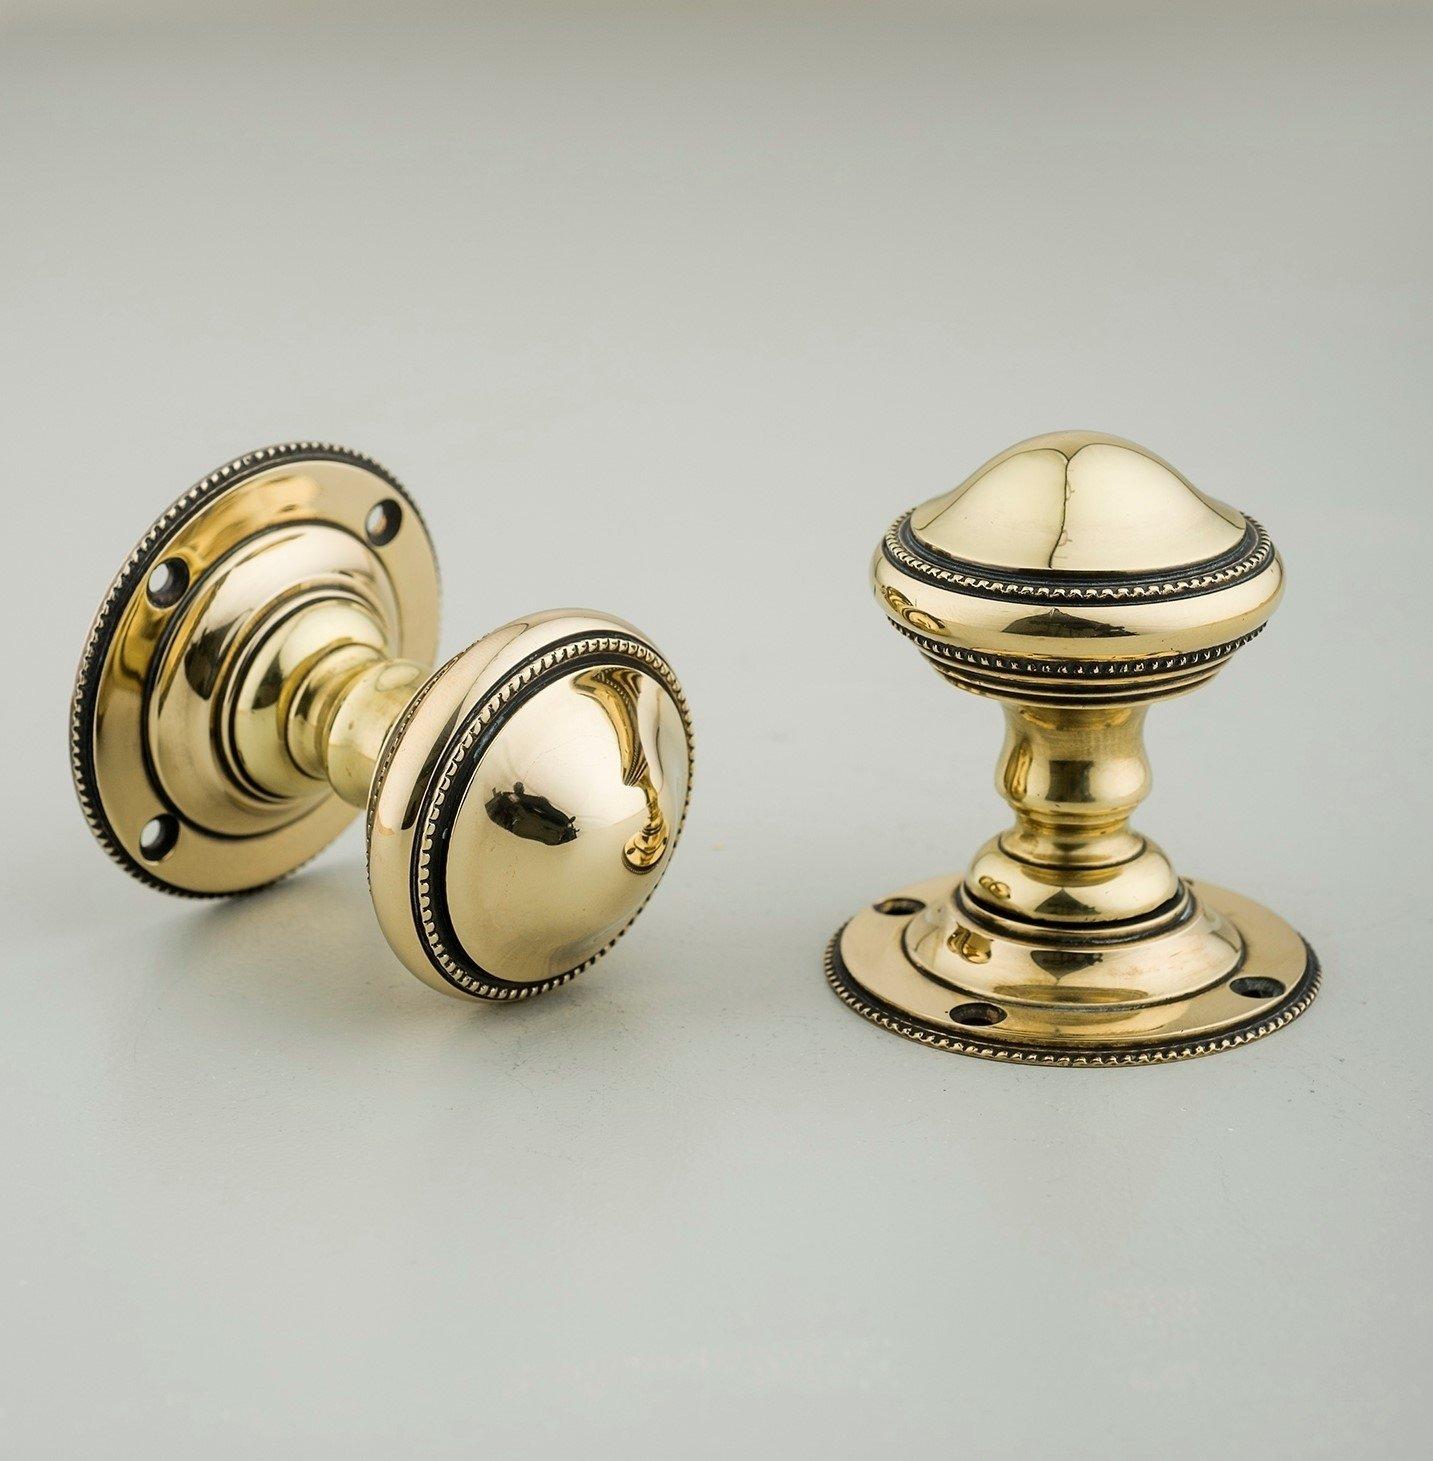 Beaded Edge Regency Door Knobs (Pair) - Brass - SAVE 10%